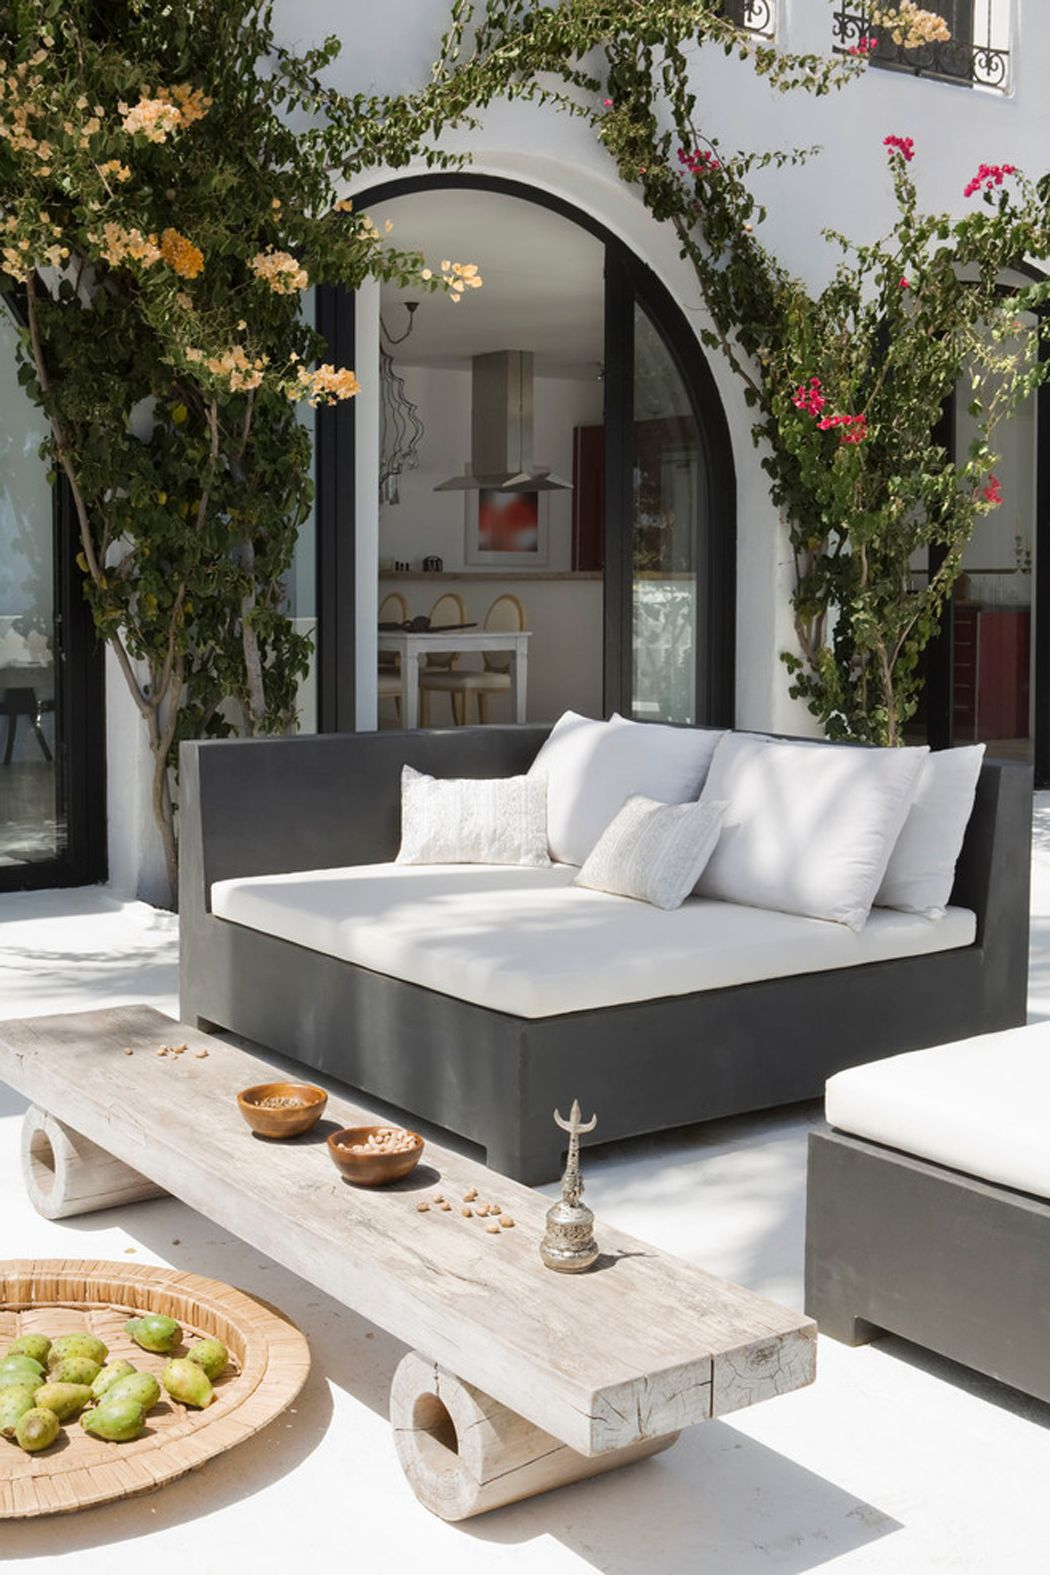 Splendide villa de luxe sur la côte sud espagnole | Outdoor living ...